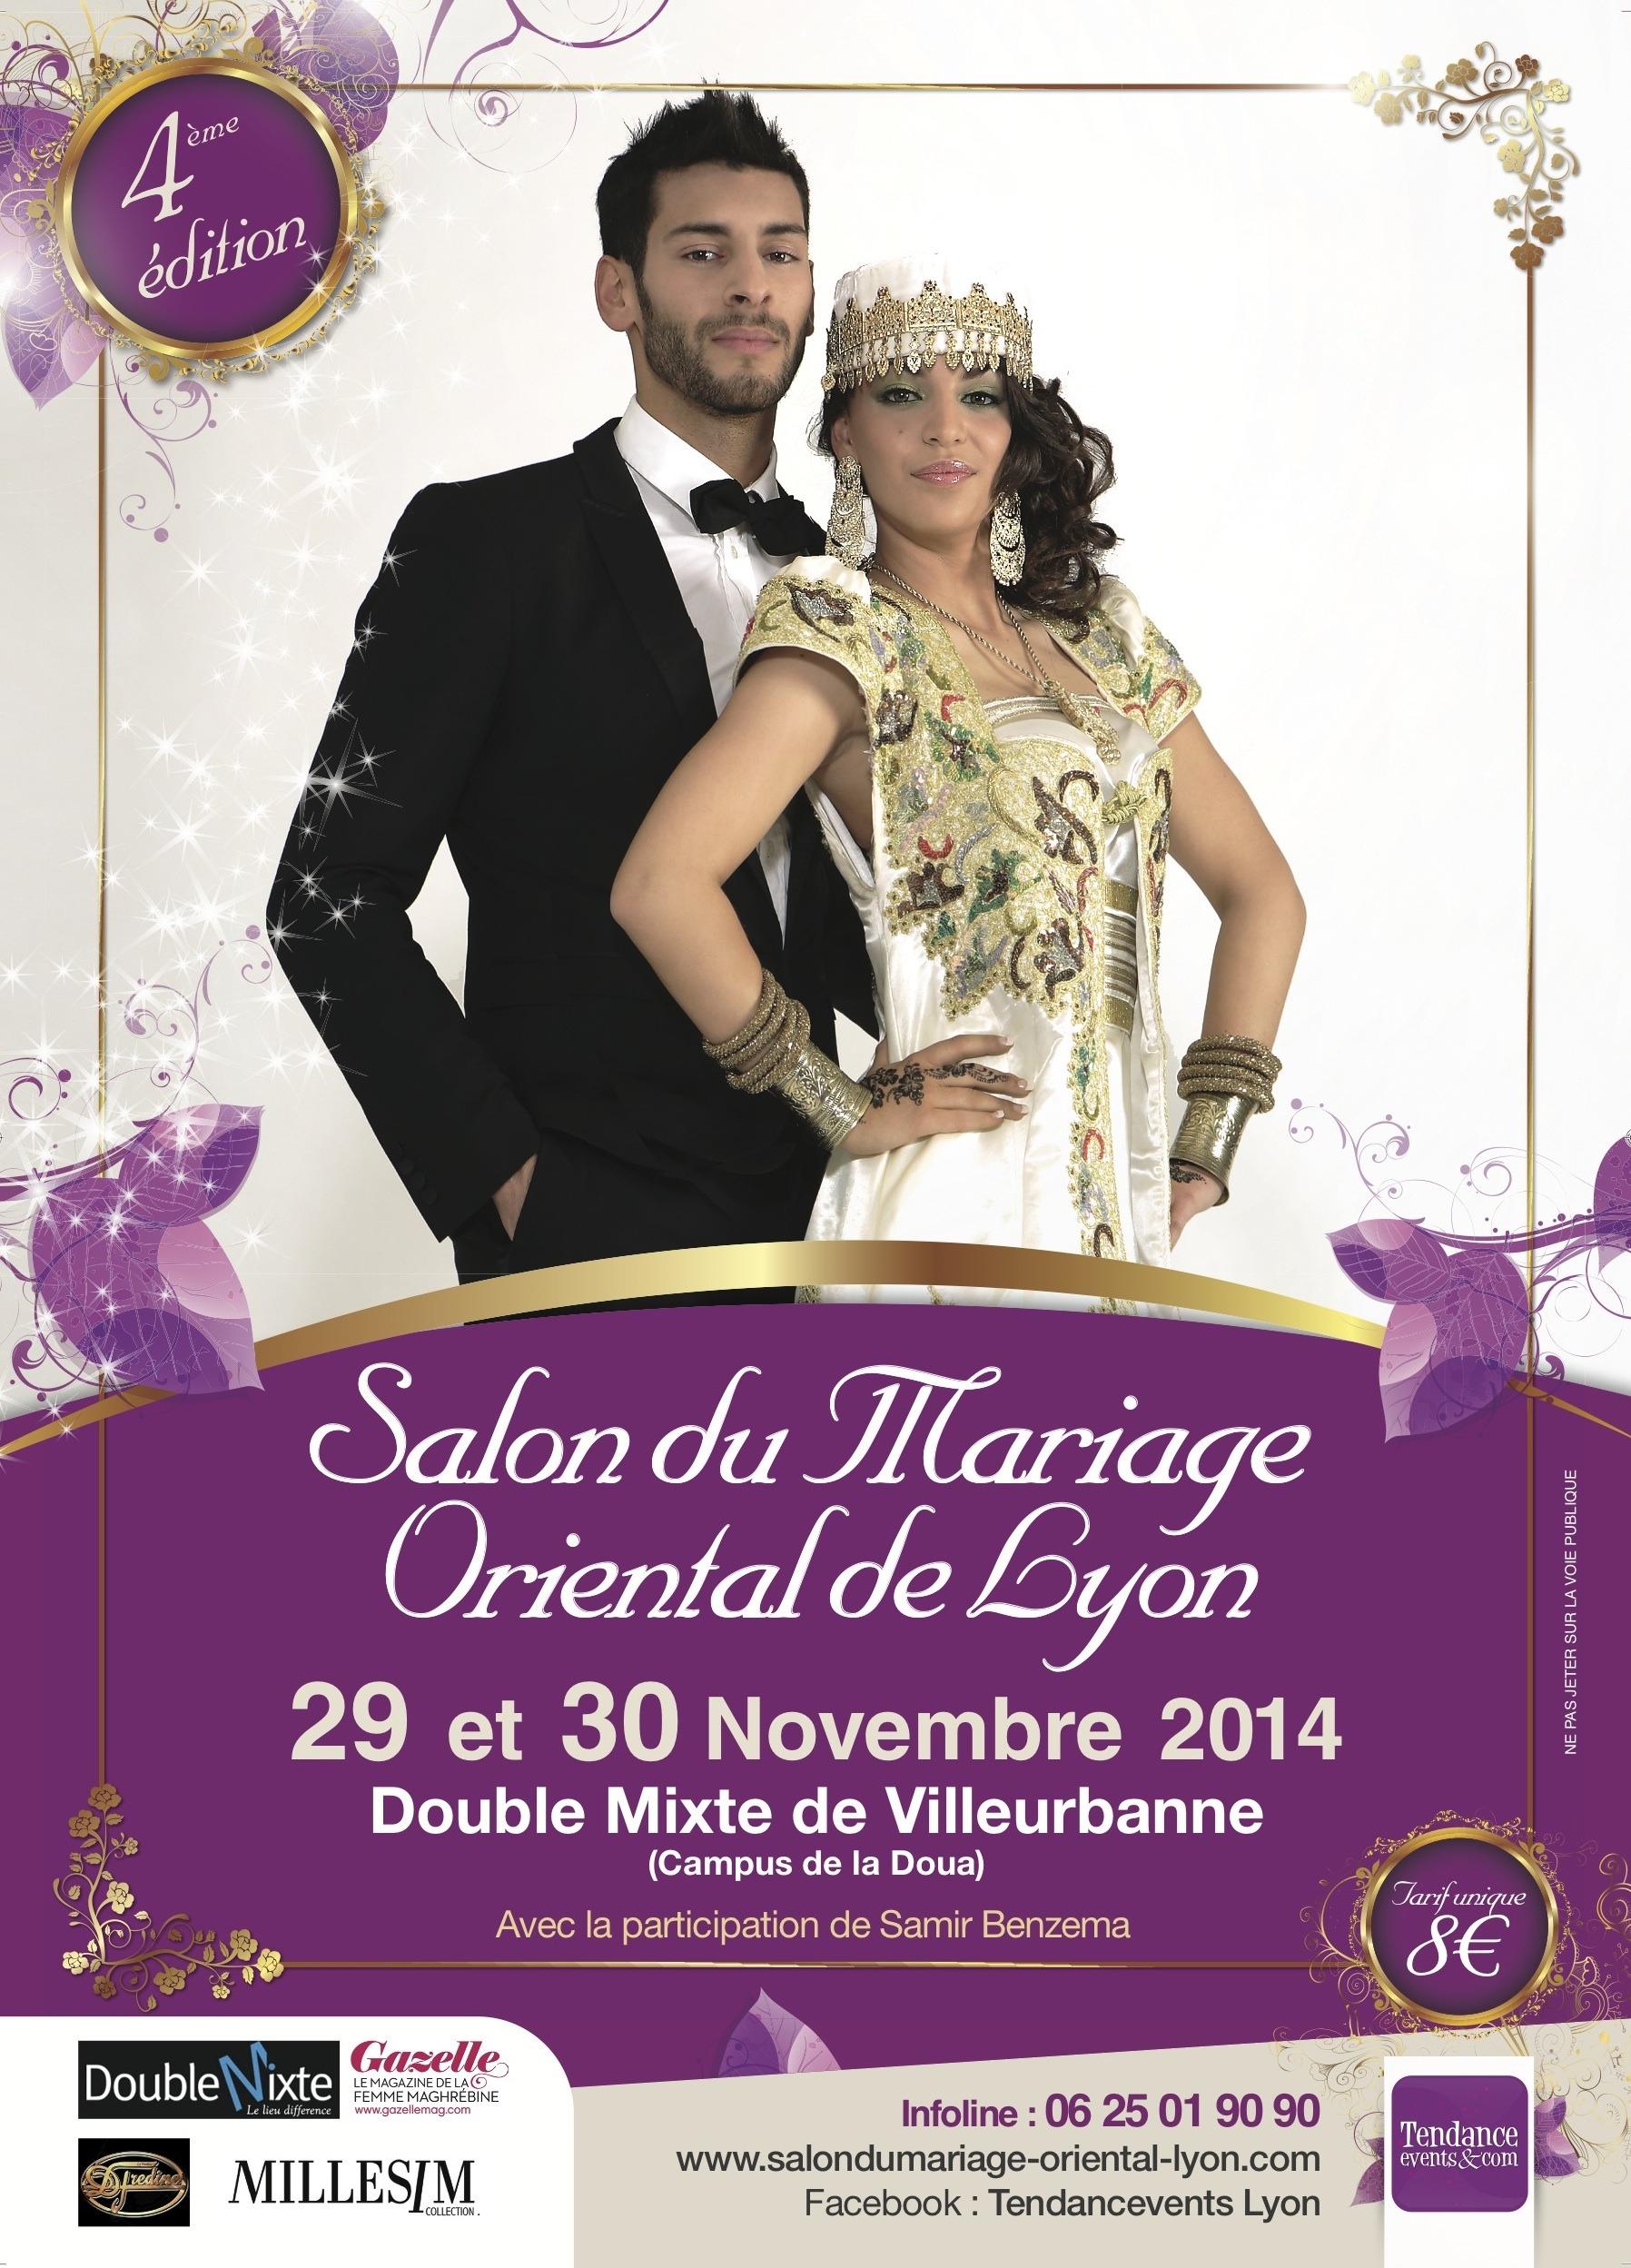 4e dition grand salon du mariage oriental de lyon by tendancevents agenda - Salon du mariage oriental lyon ...